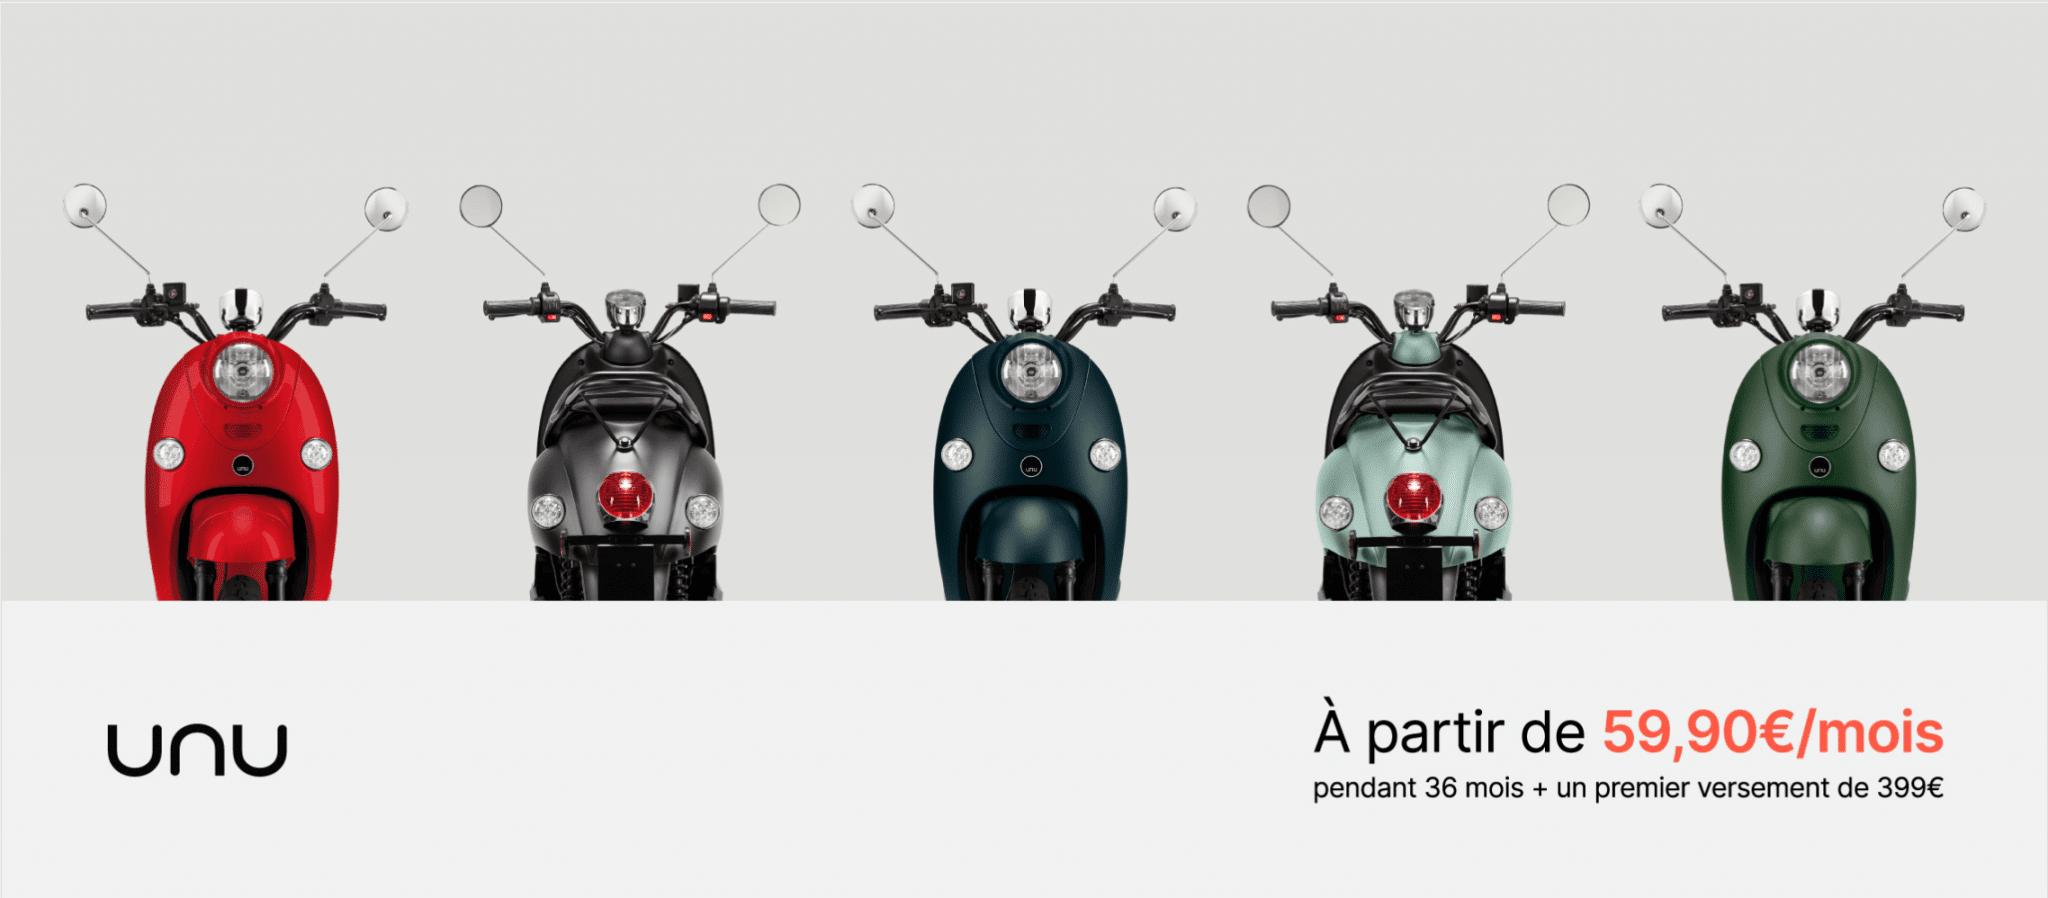 leasing location scooter electrique unu france